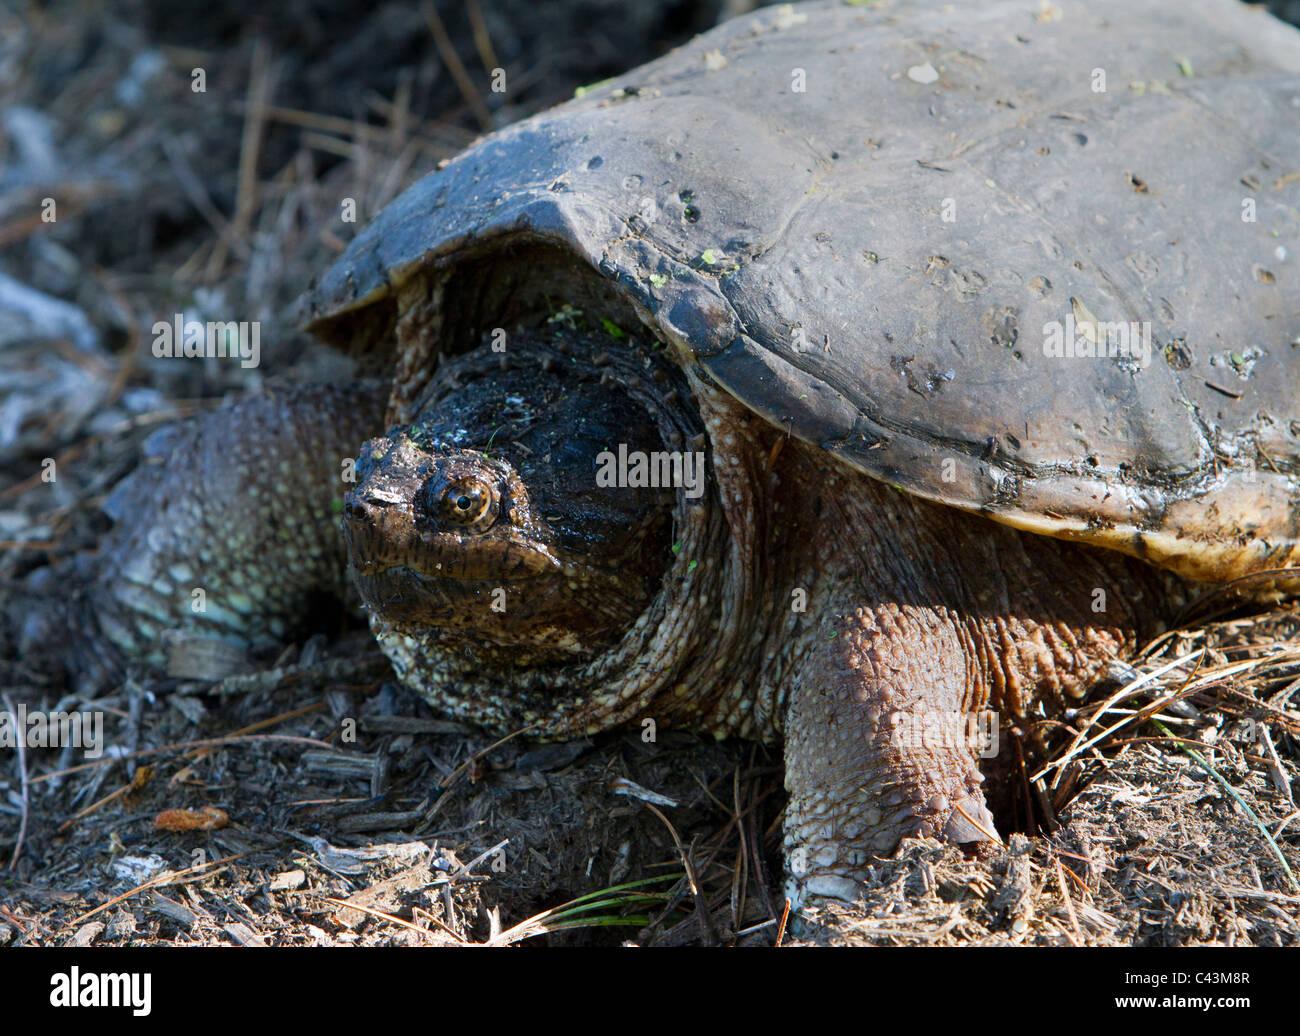 common snapping turtle, Chelydra serpentina Stock Photo